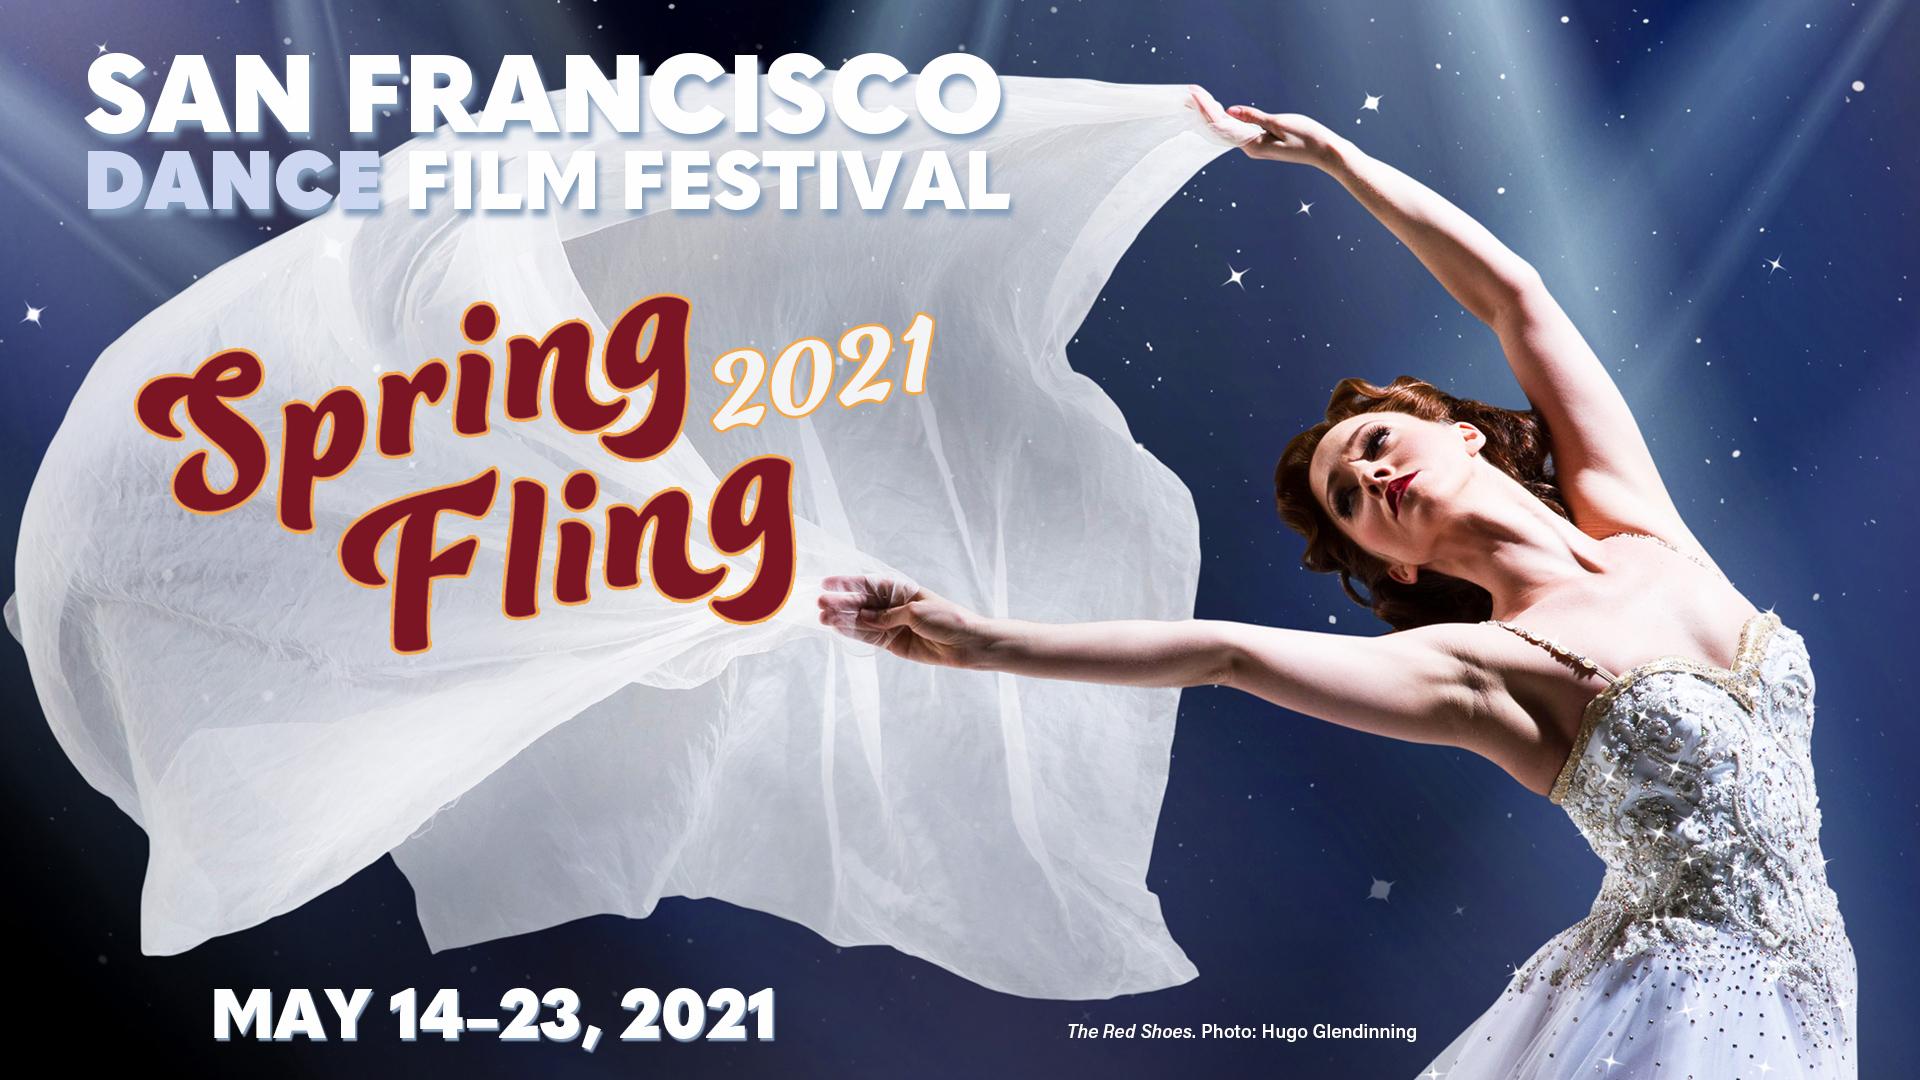 San Francisco Dance Film Festival Spring Fling